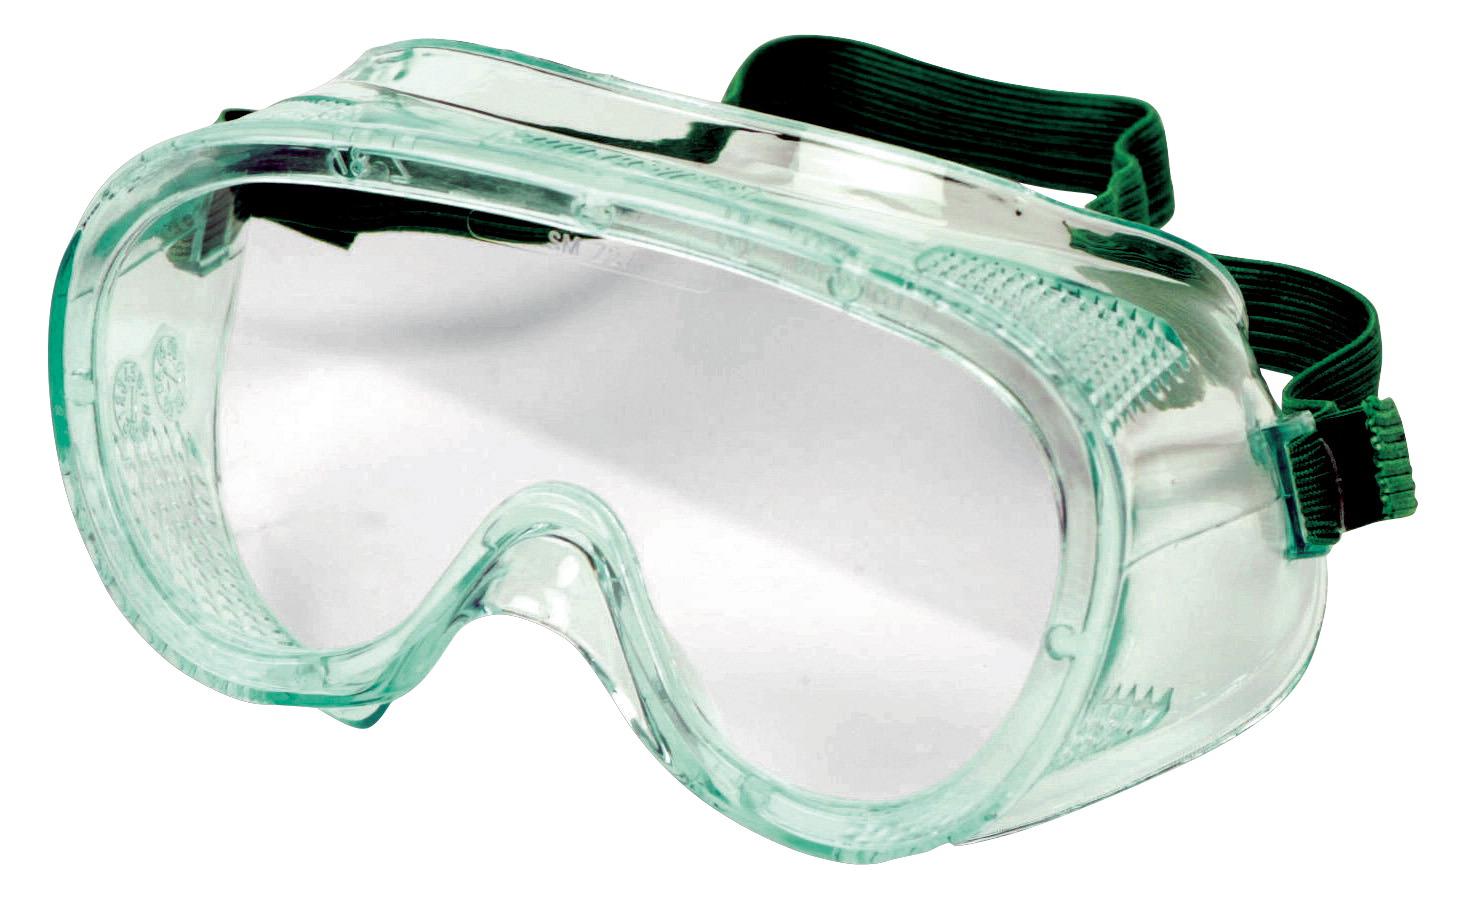 safety goggle frey scientific cpo science